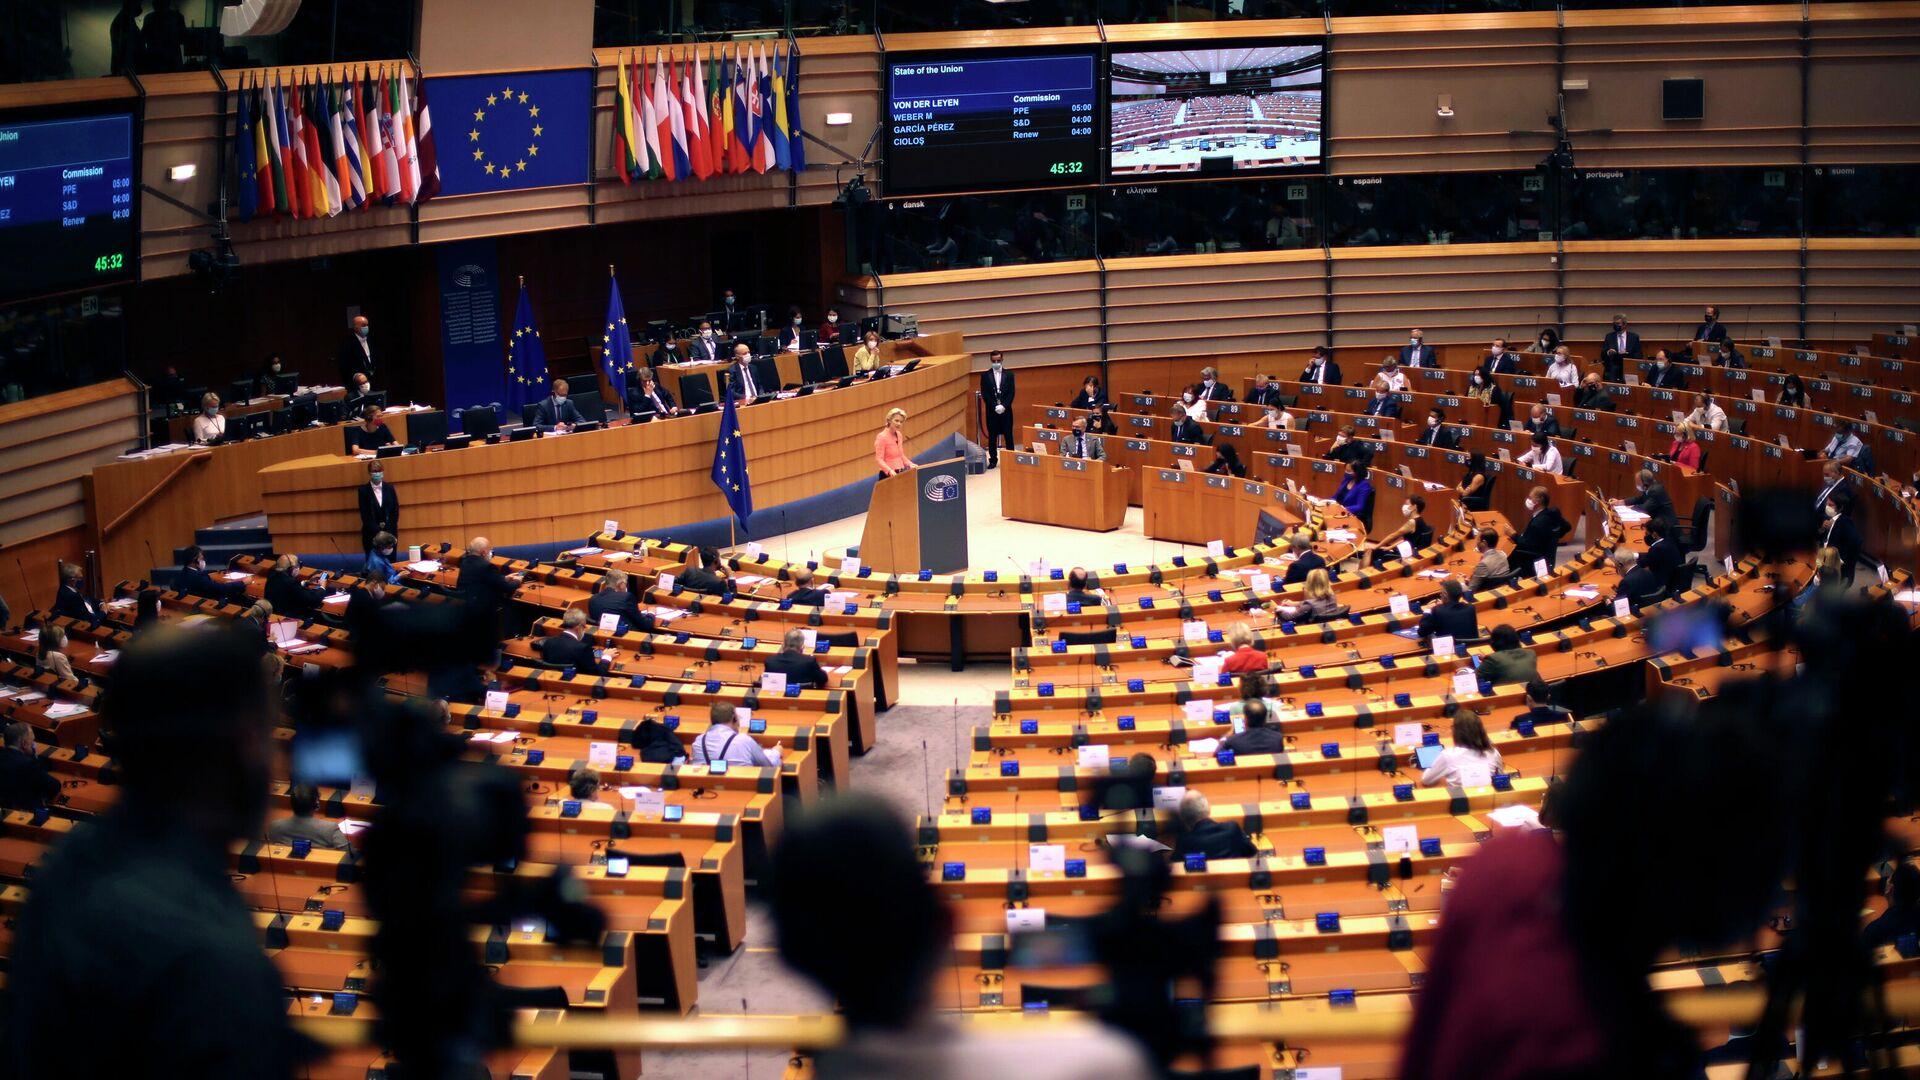 EU-Kommission in Brüssel - SNA, 1920, 27.02.2021